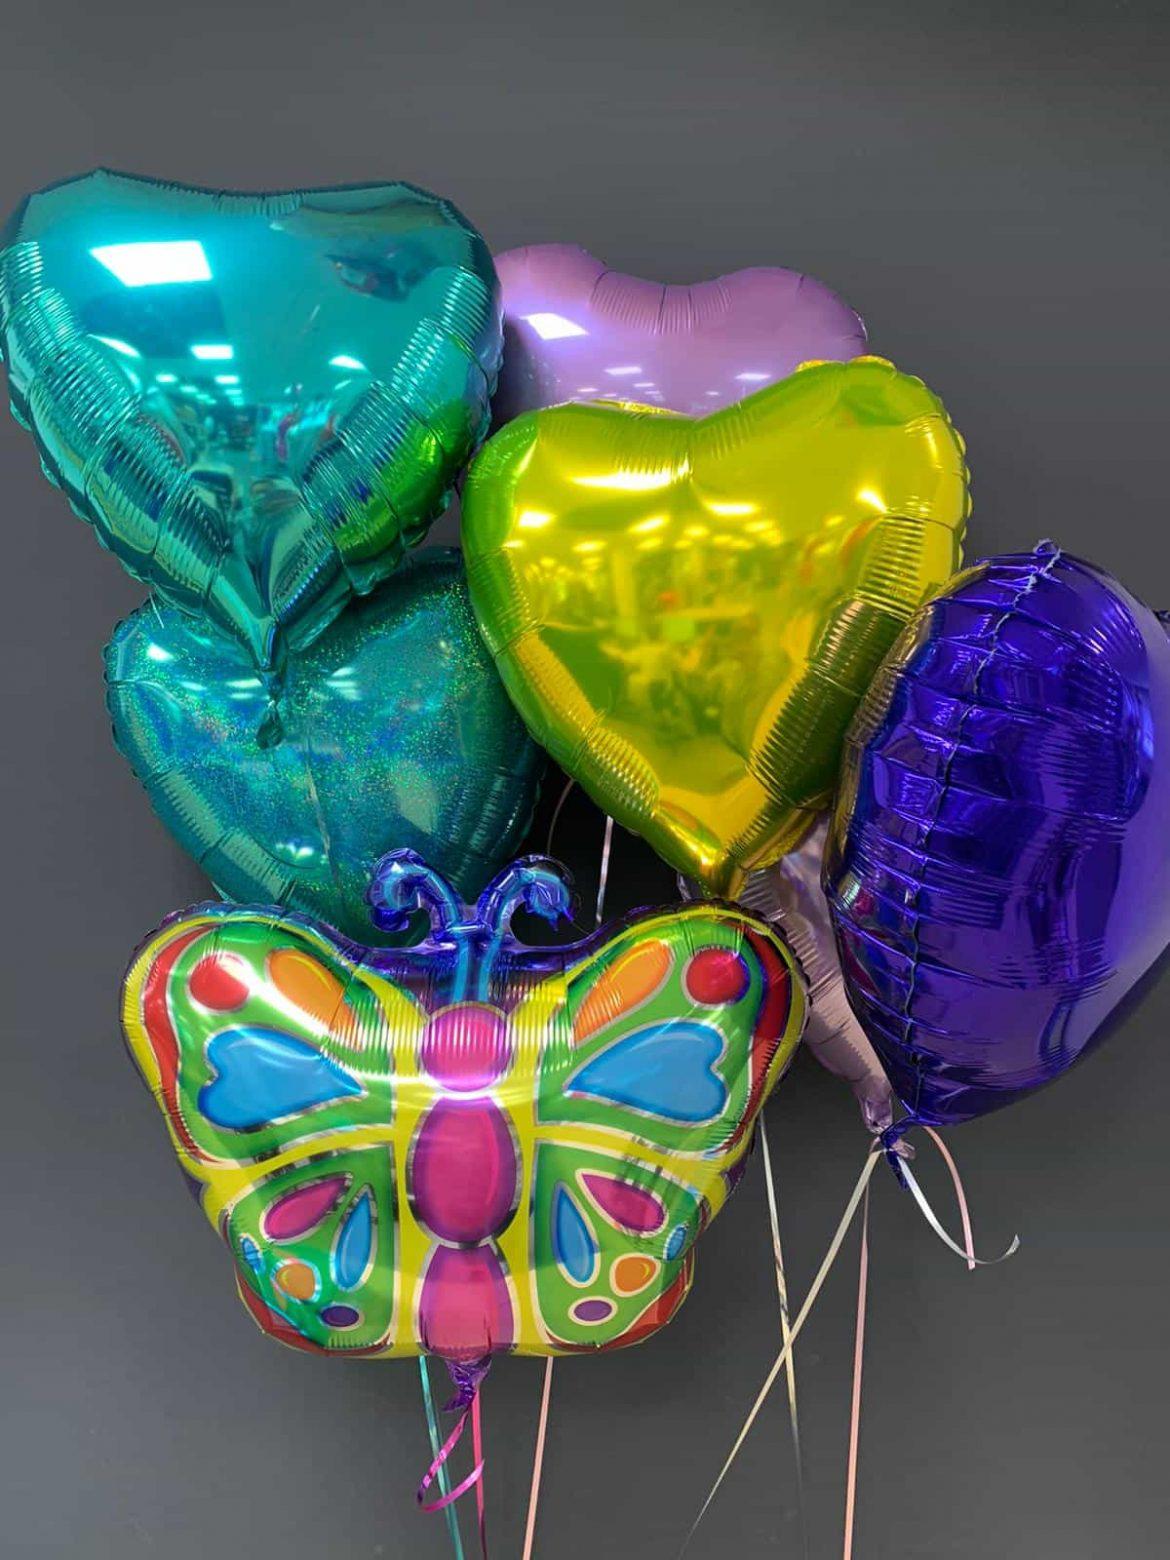 Schmetterling Ballon € 5,50 und Dekoballons je € 4,50 1